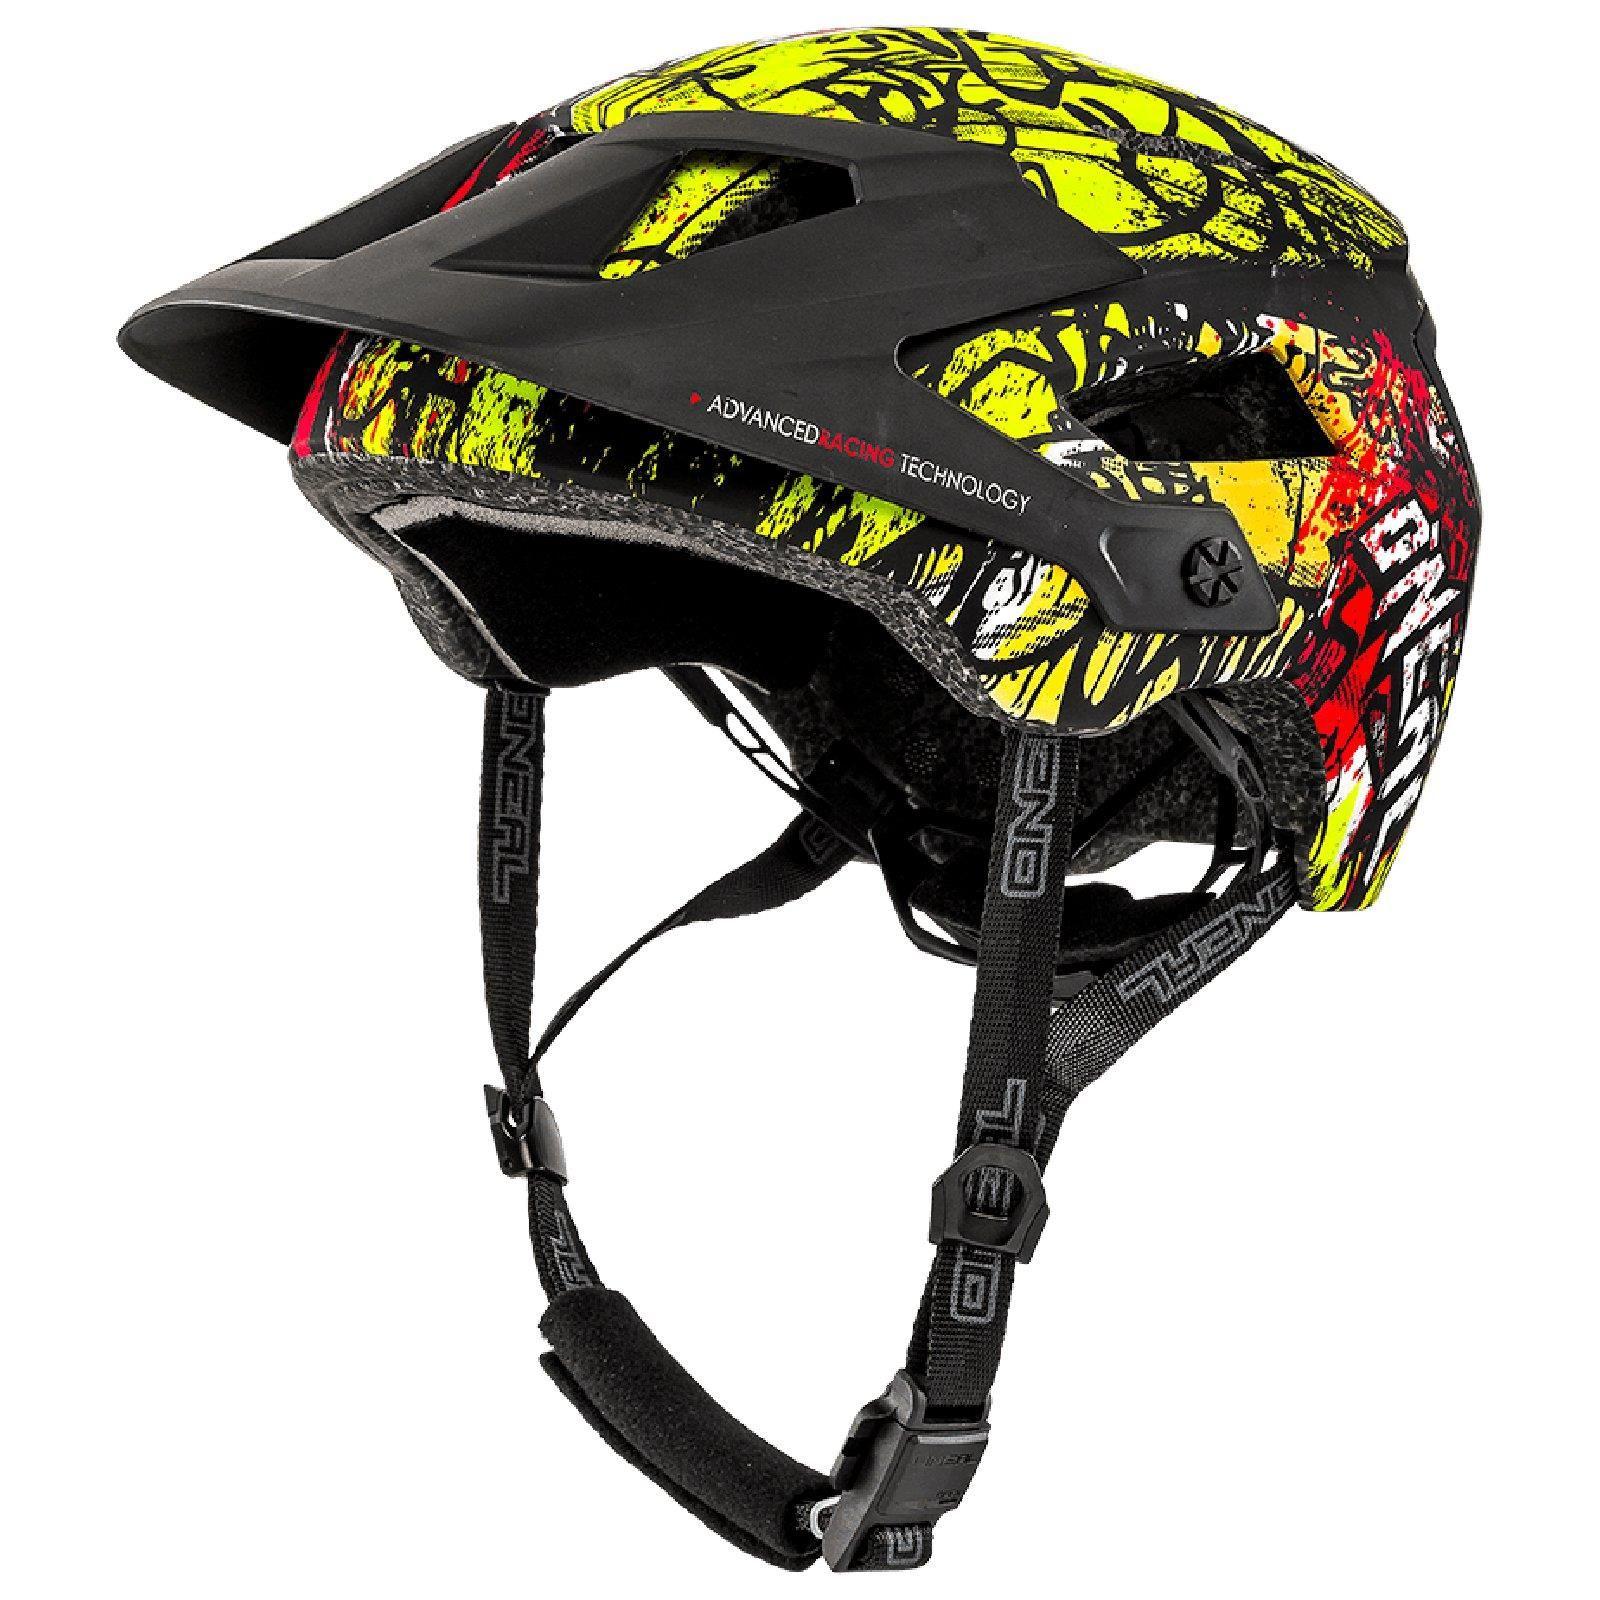 Oneal Defender Fahrrad Helm All Mountain Enduro Mountain Bike Trail Mtb Fidlock Ad Ad Helm Mountain Fahrrad Black And Red Red Yellow Yellow